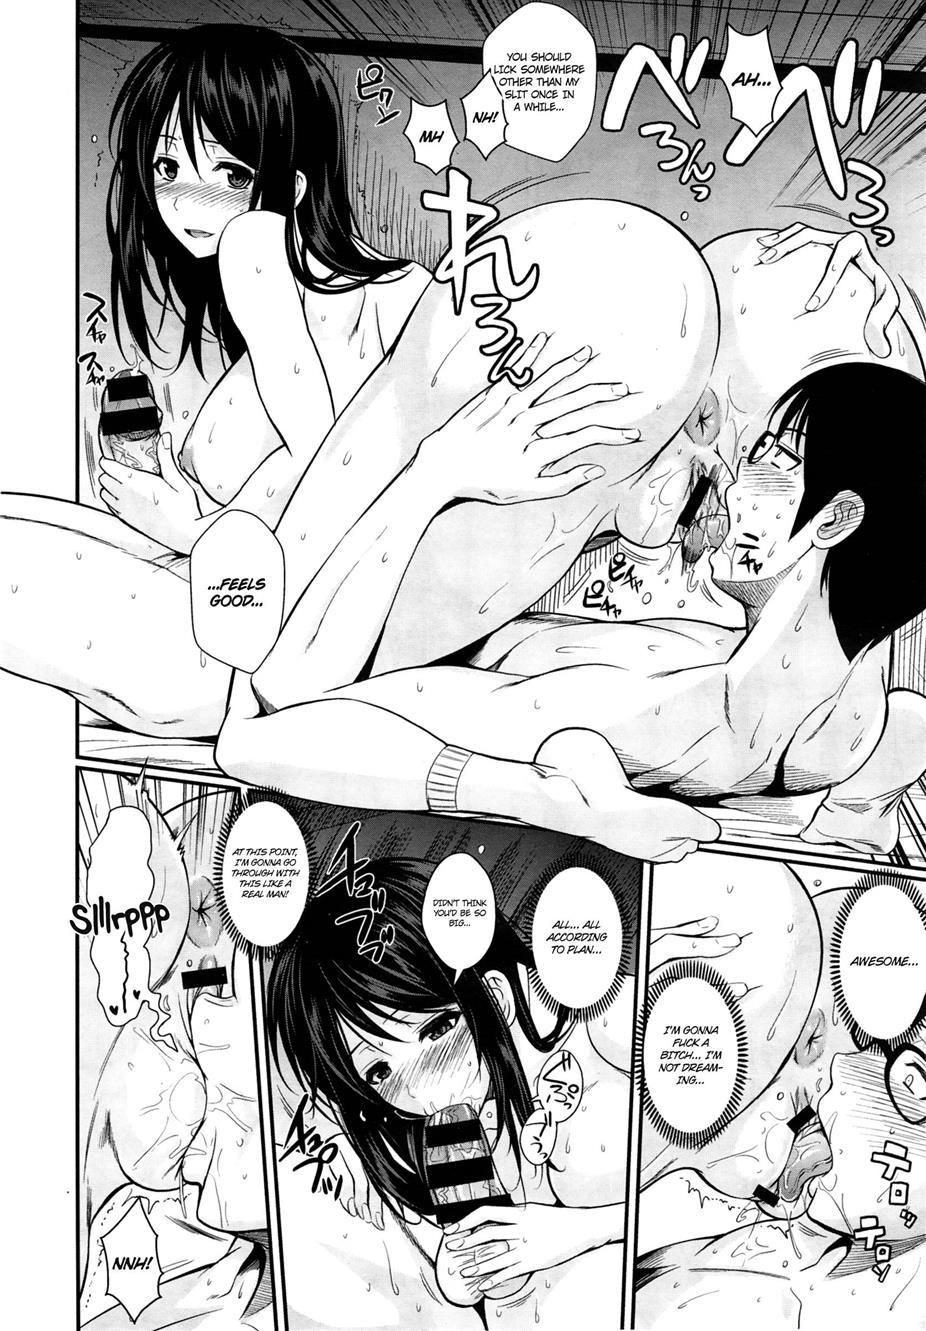 Hentai execution pics hentai clips